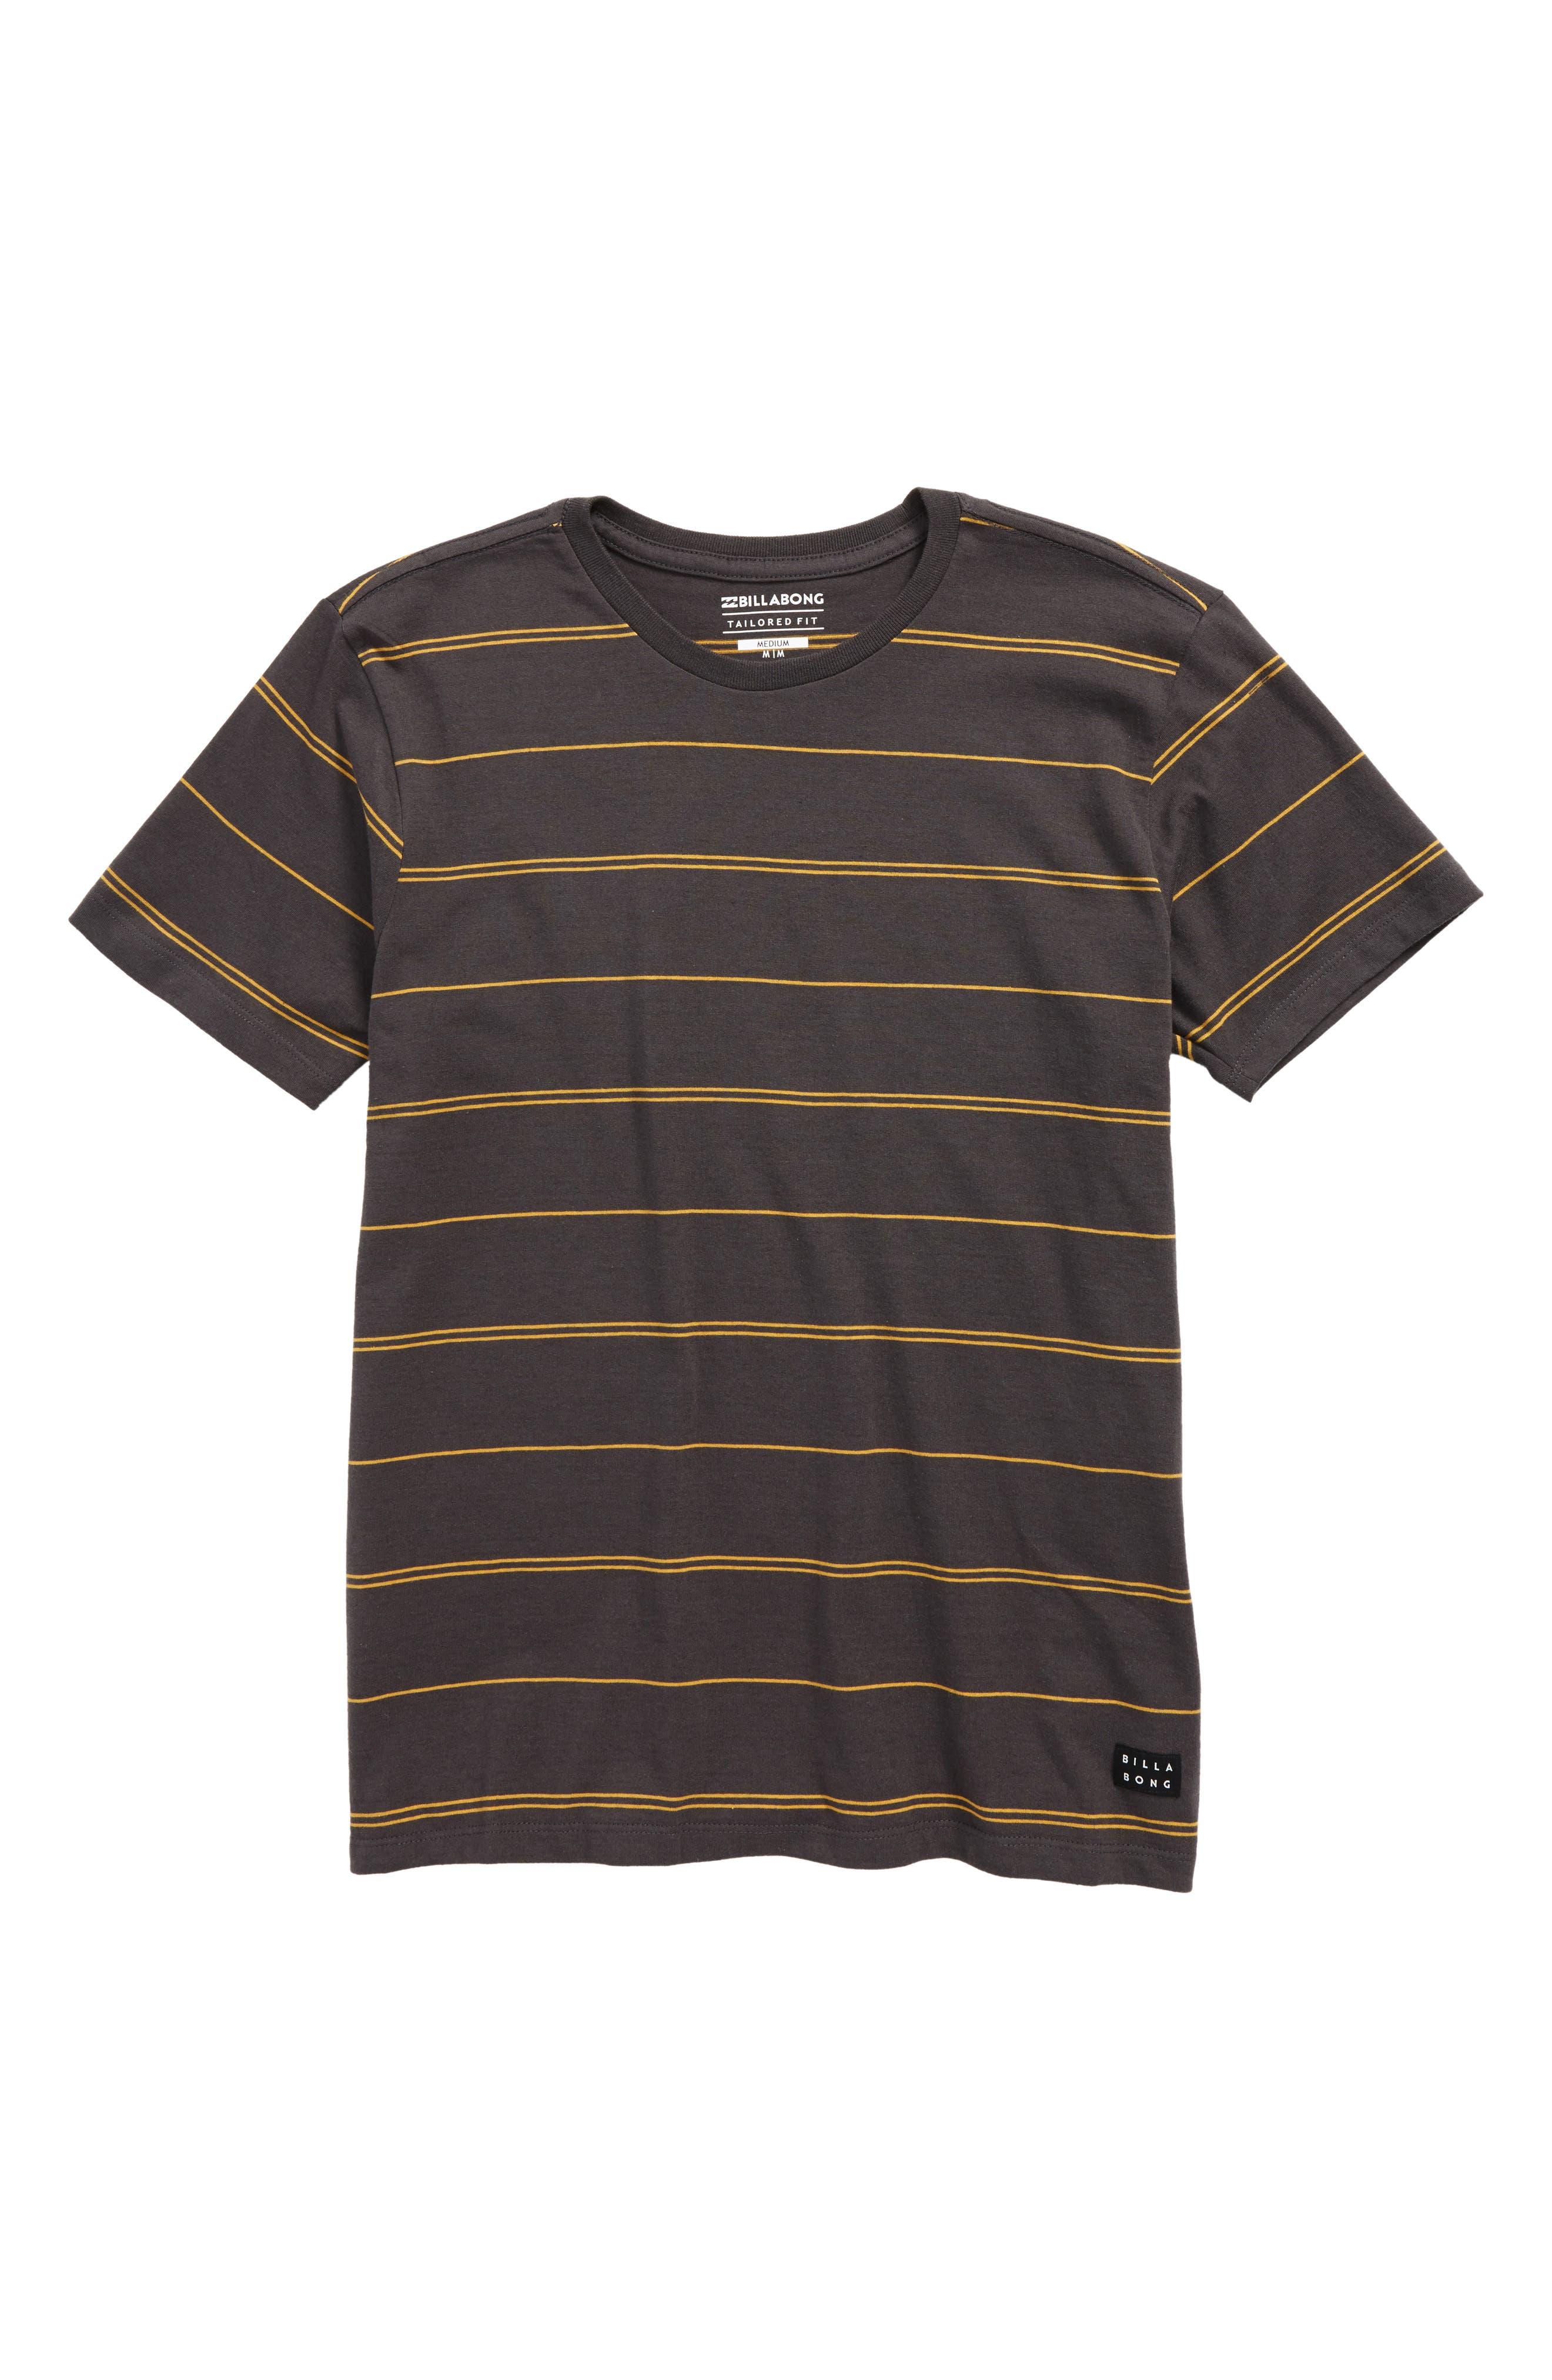 Main Image - Billabong Die Cut Stripe Ringer T-Shirt (Big Boys)